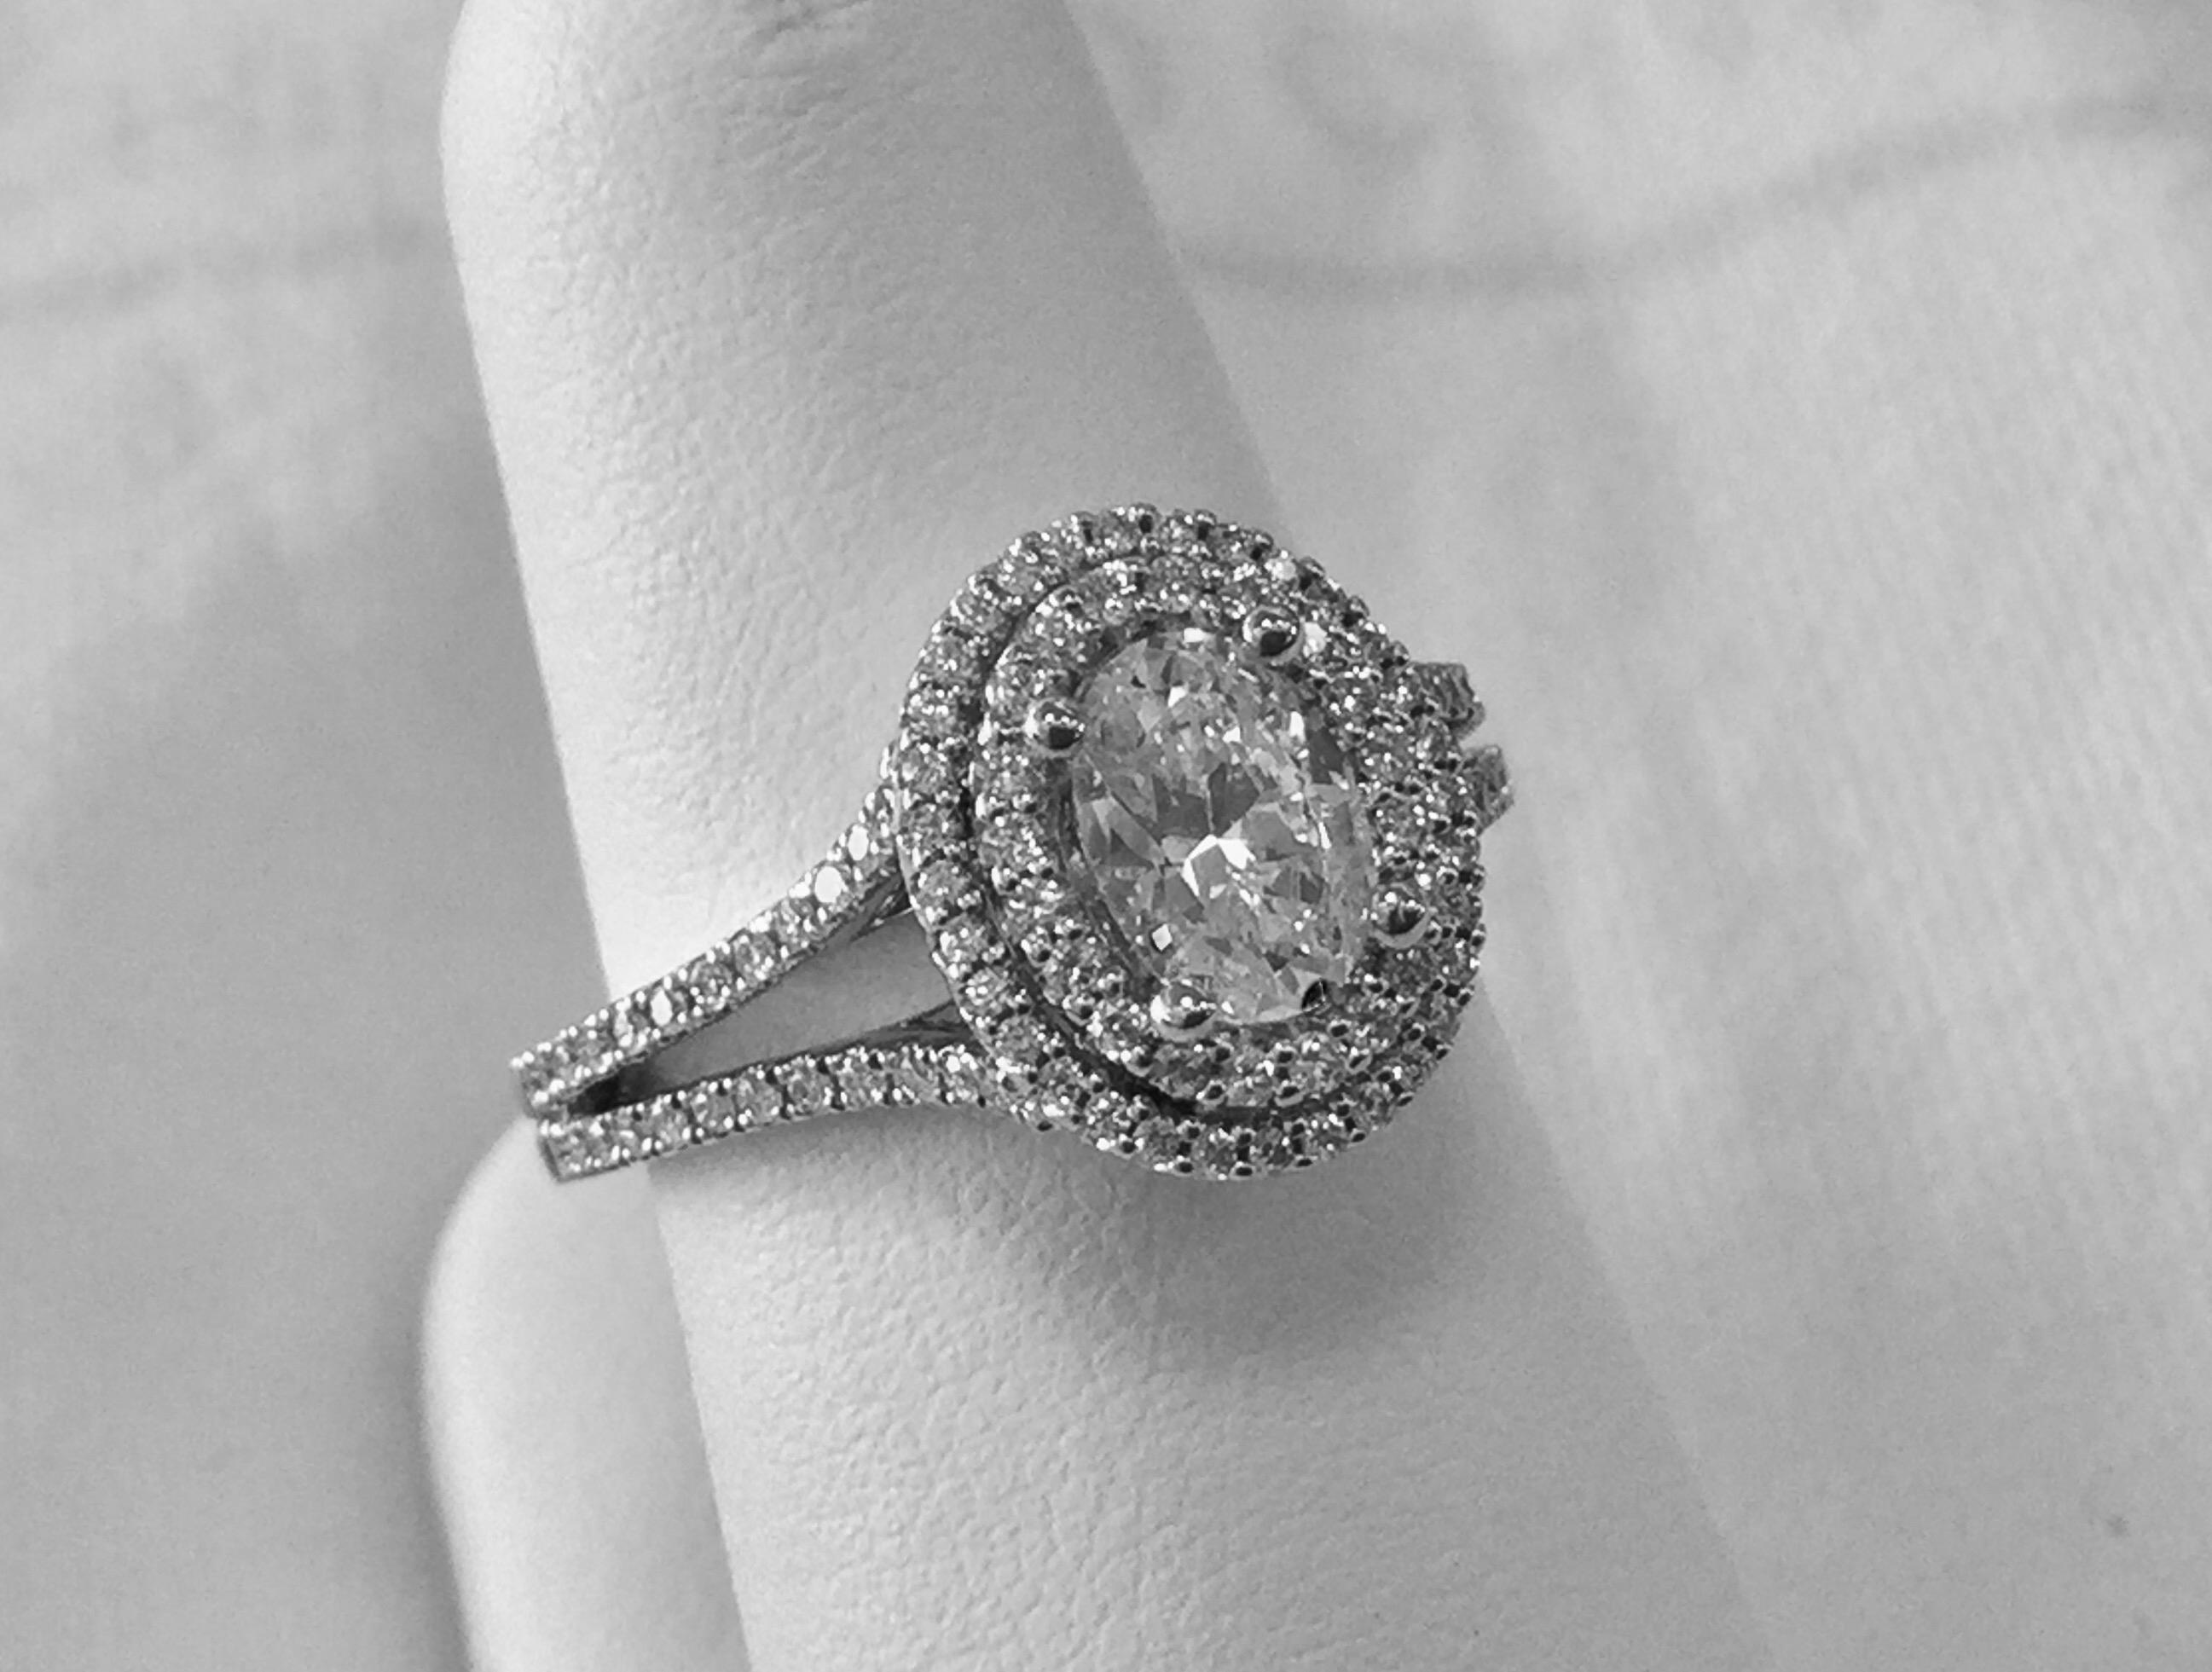 Emerald Lady Jewelry image 15